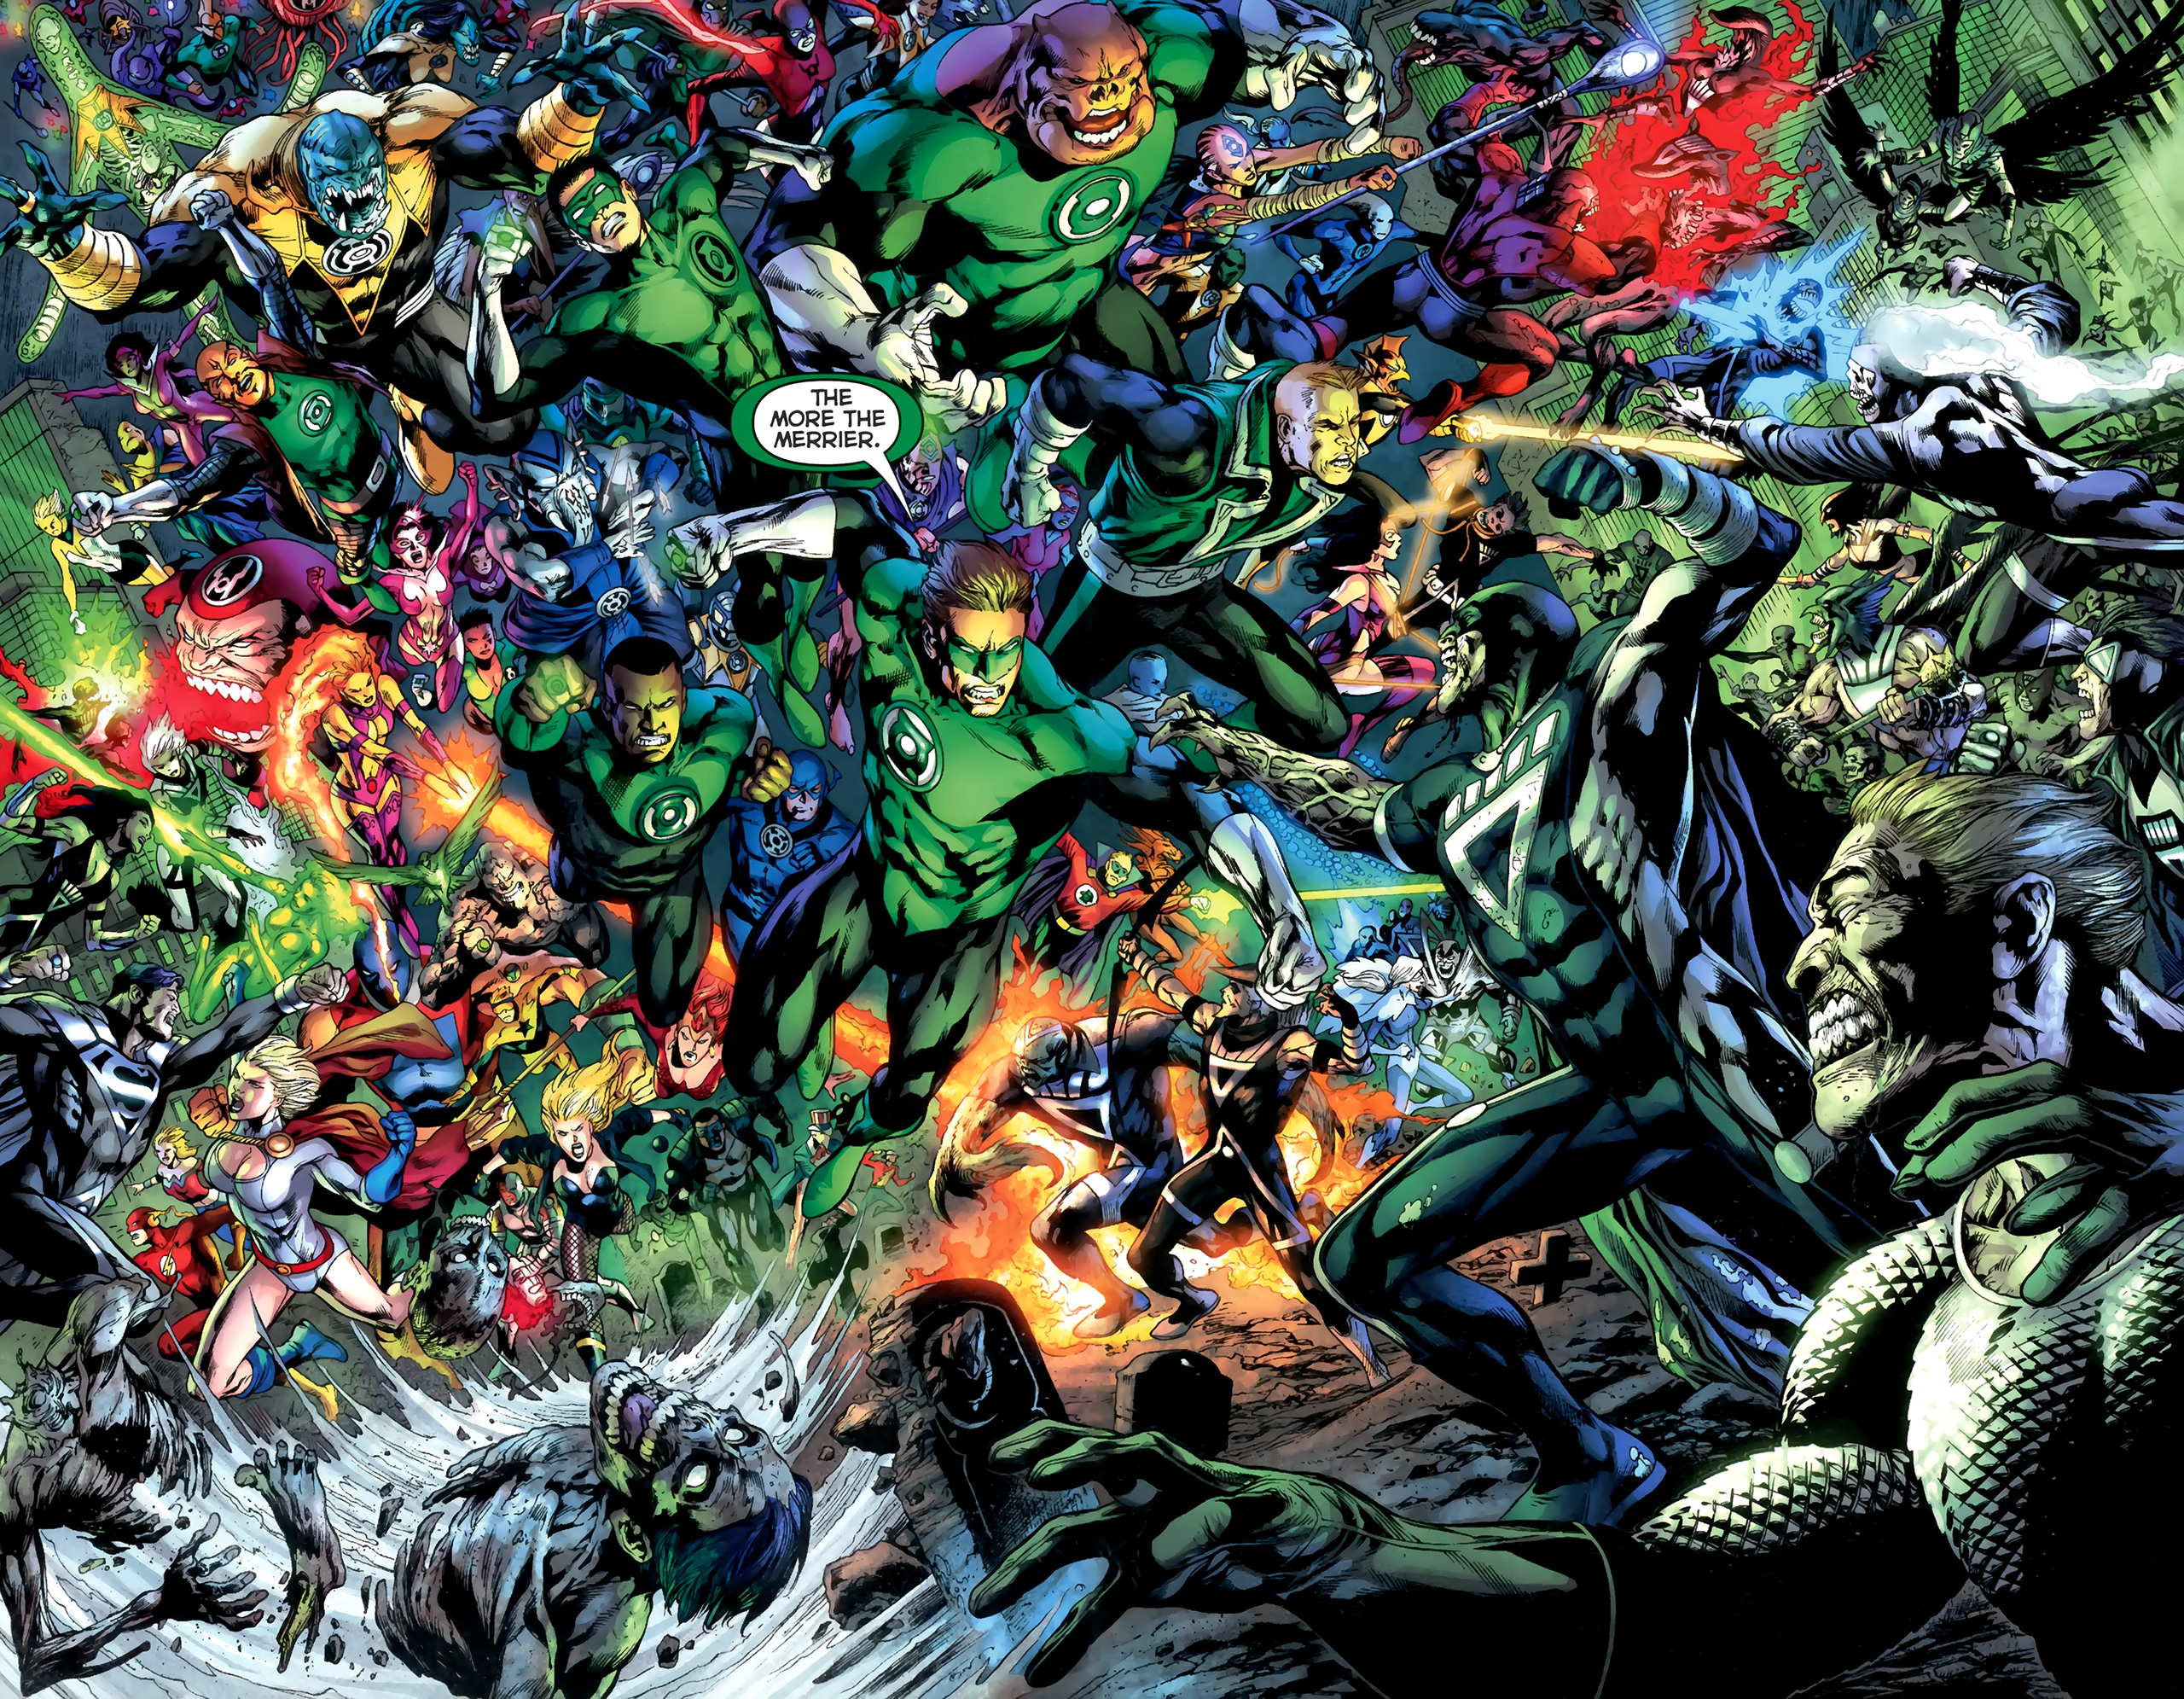 Green Lantern Corps HD Wallpaper